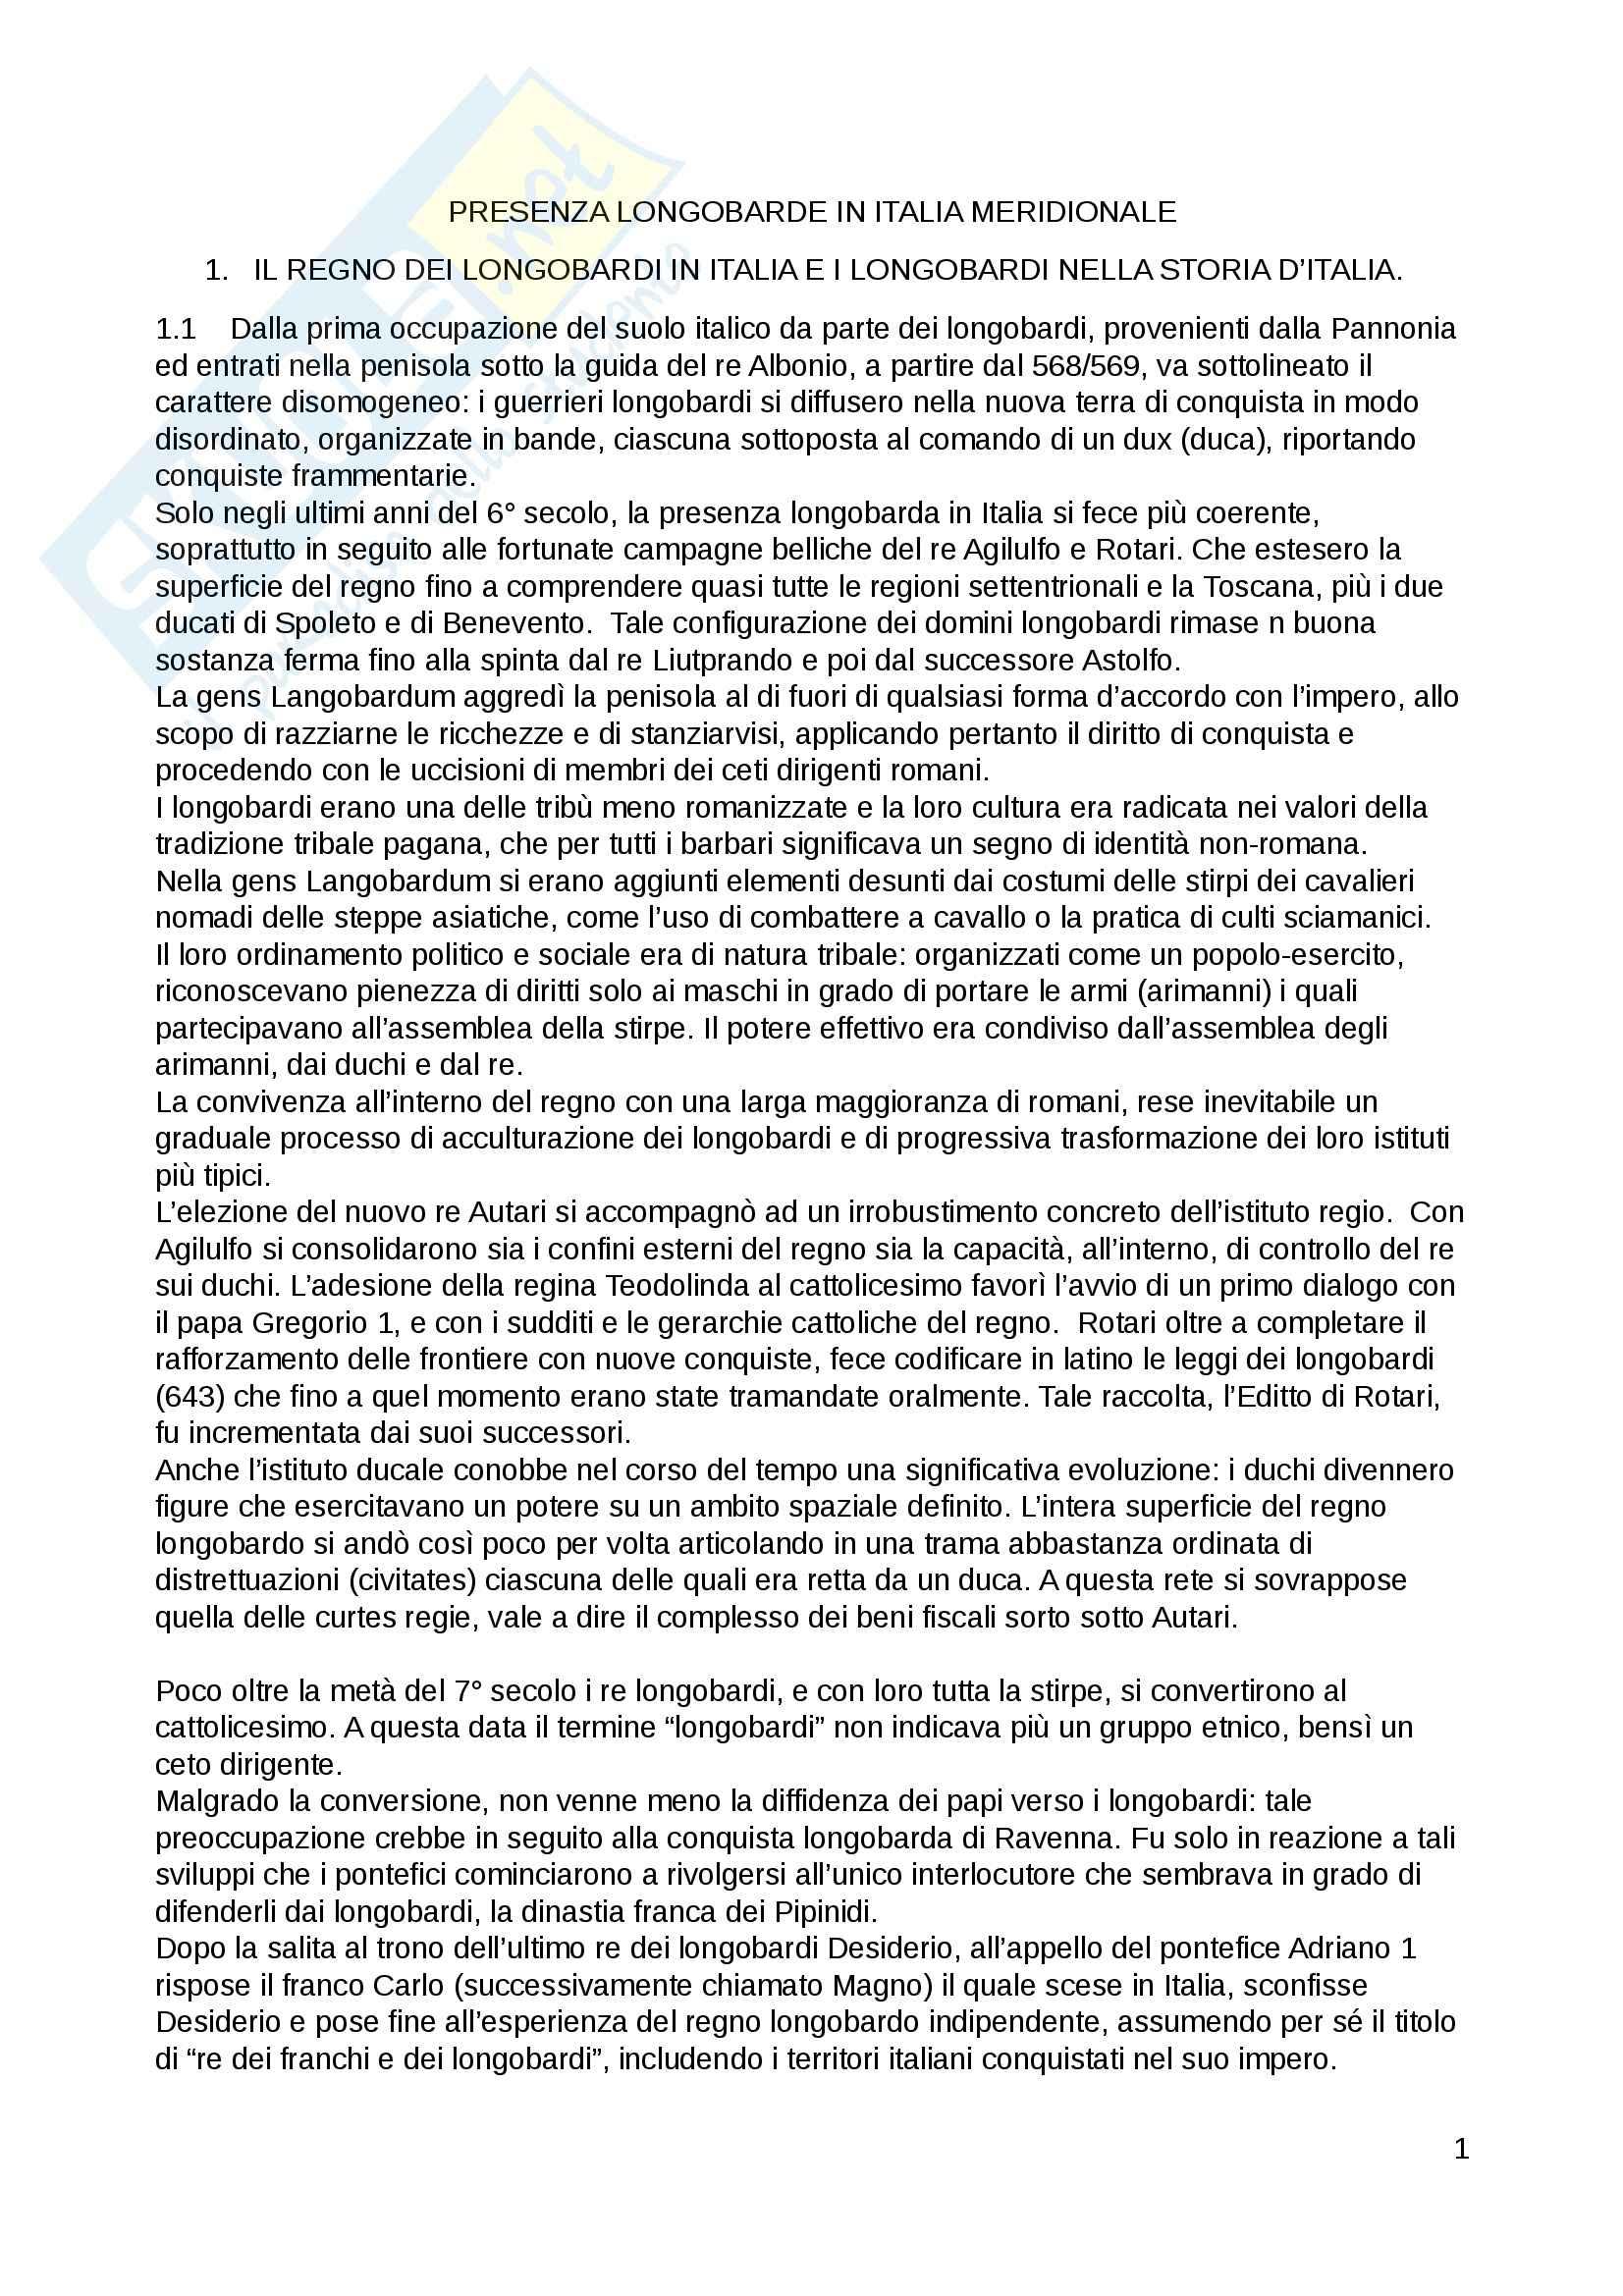 Presenza longobarda in Italia meridionale, Filologia germanica